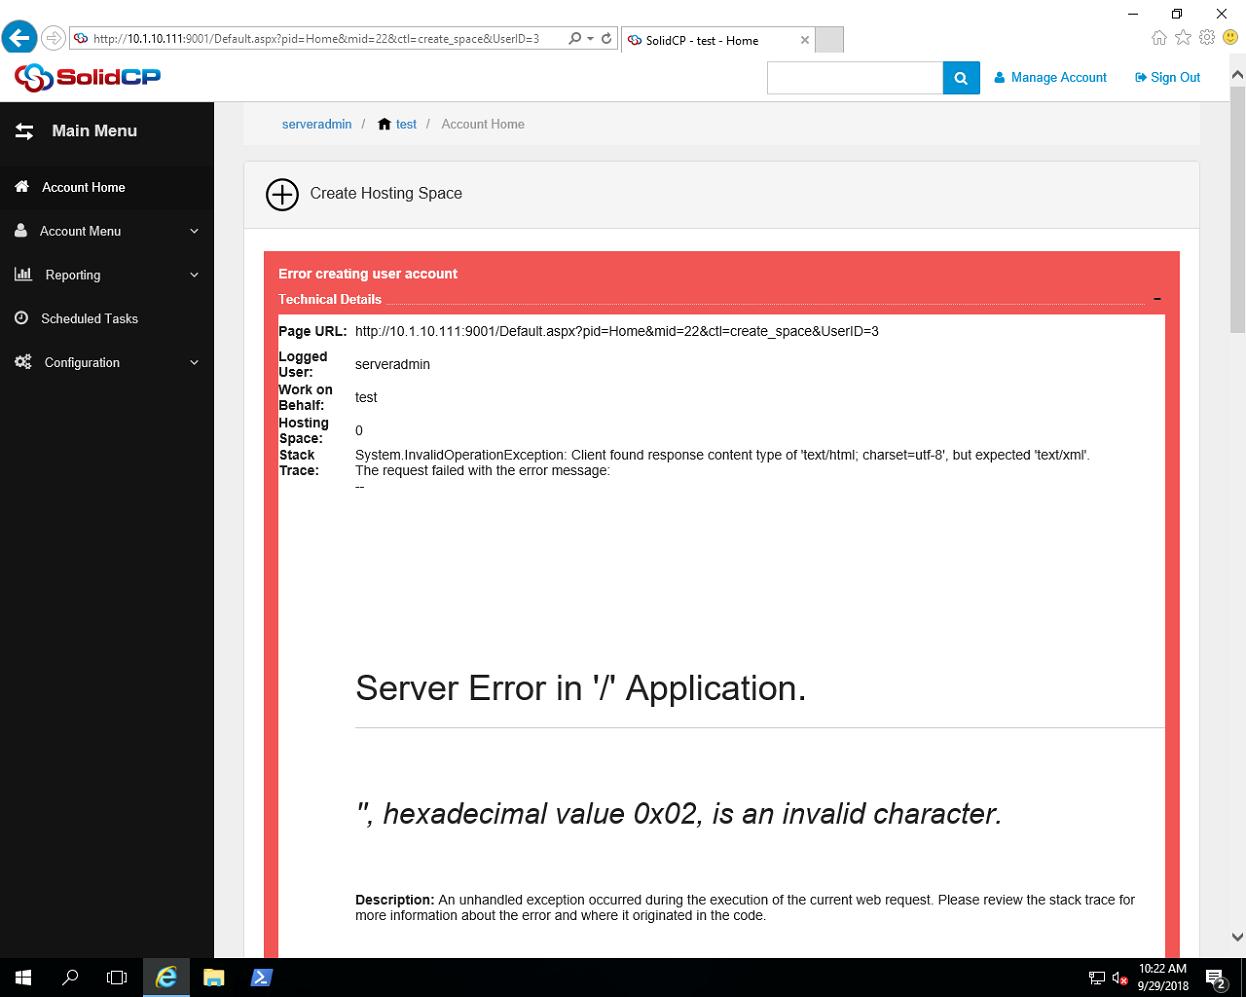 Error creating user account - SolidCP